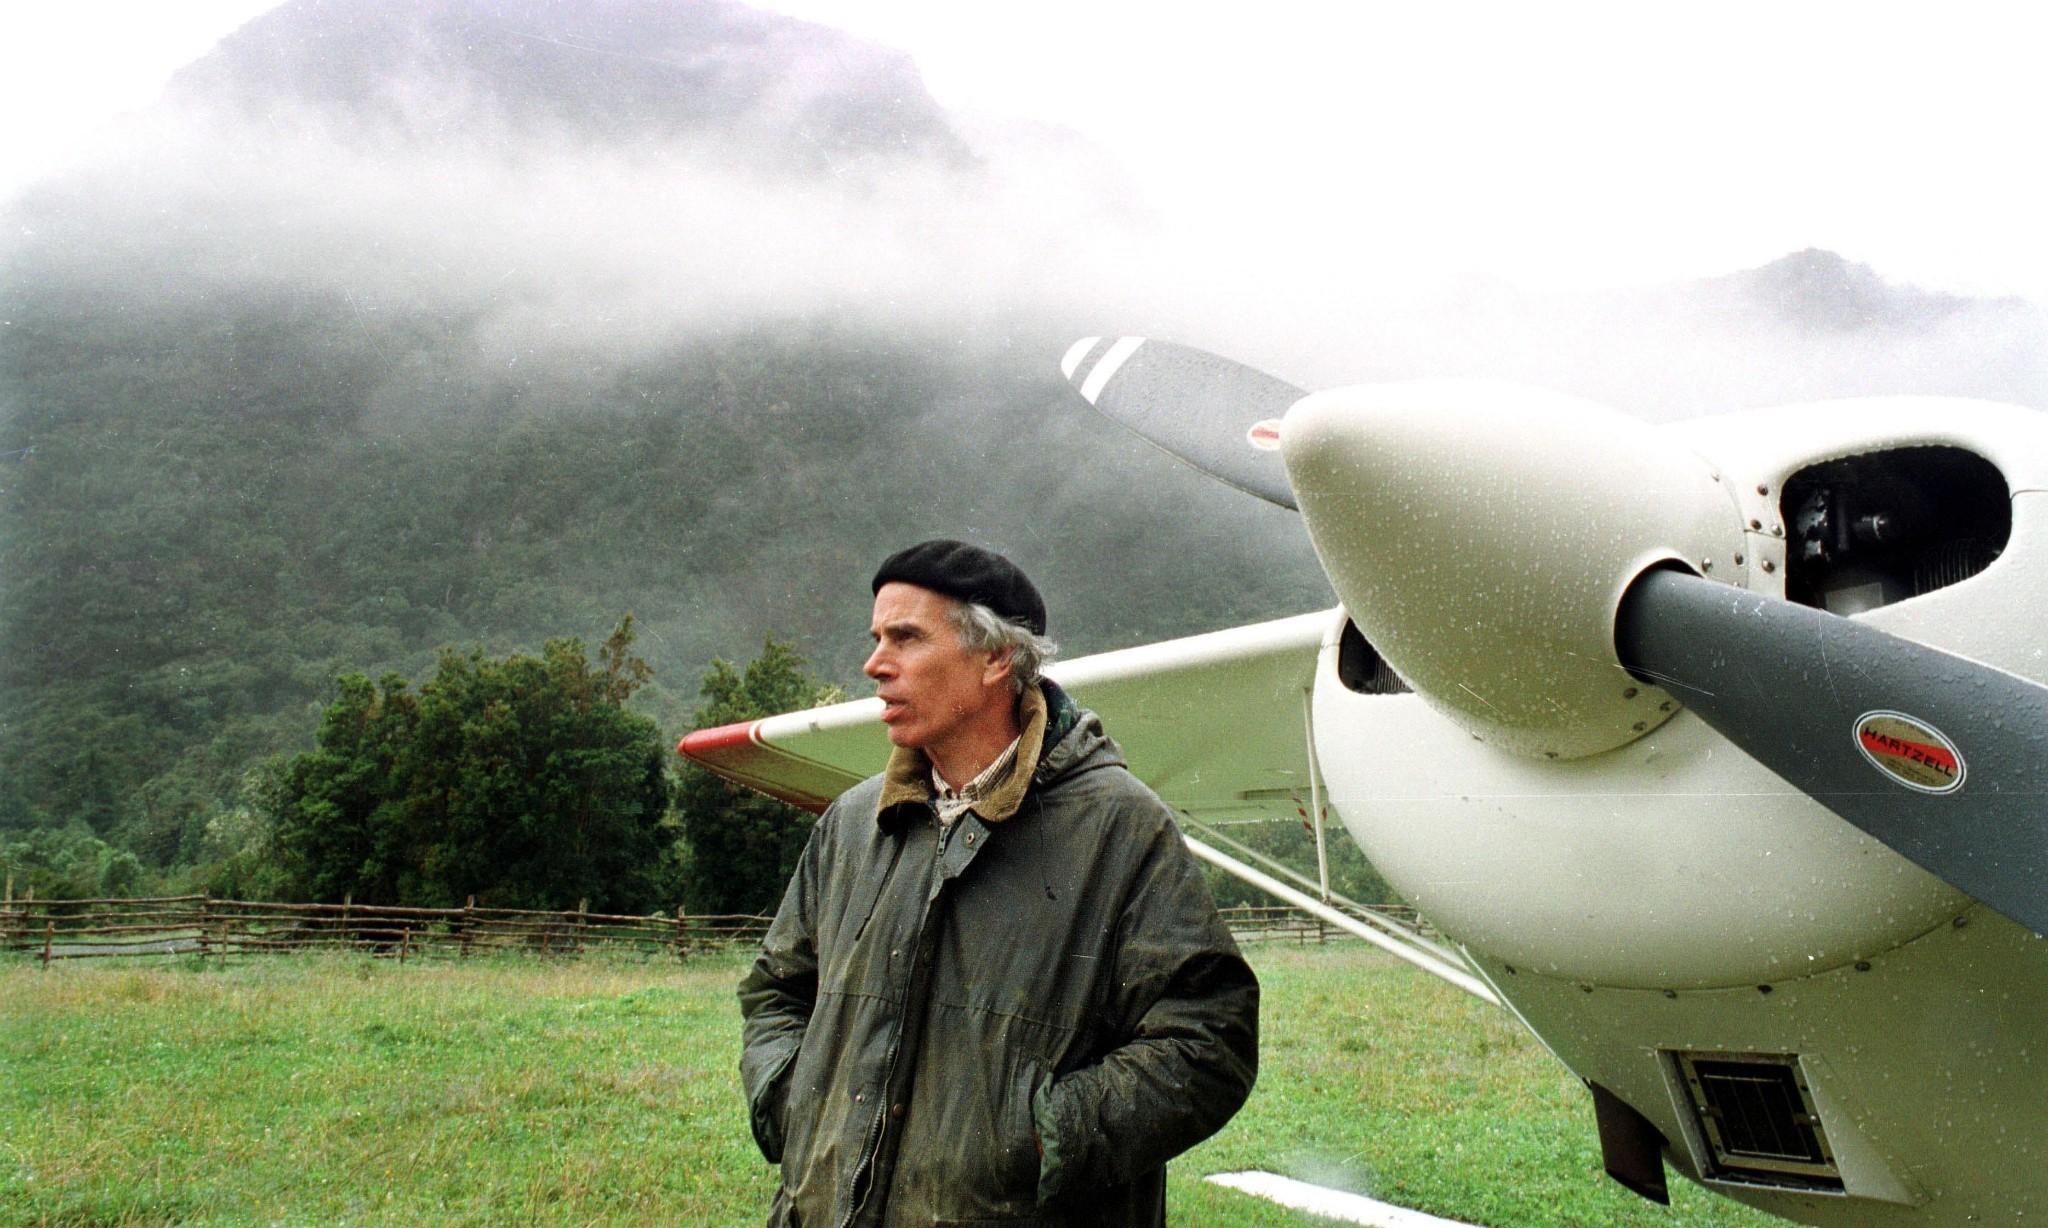 Douglas Tompkins, billionaire behind North Face, dies after kayak accident